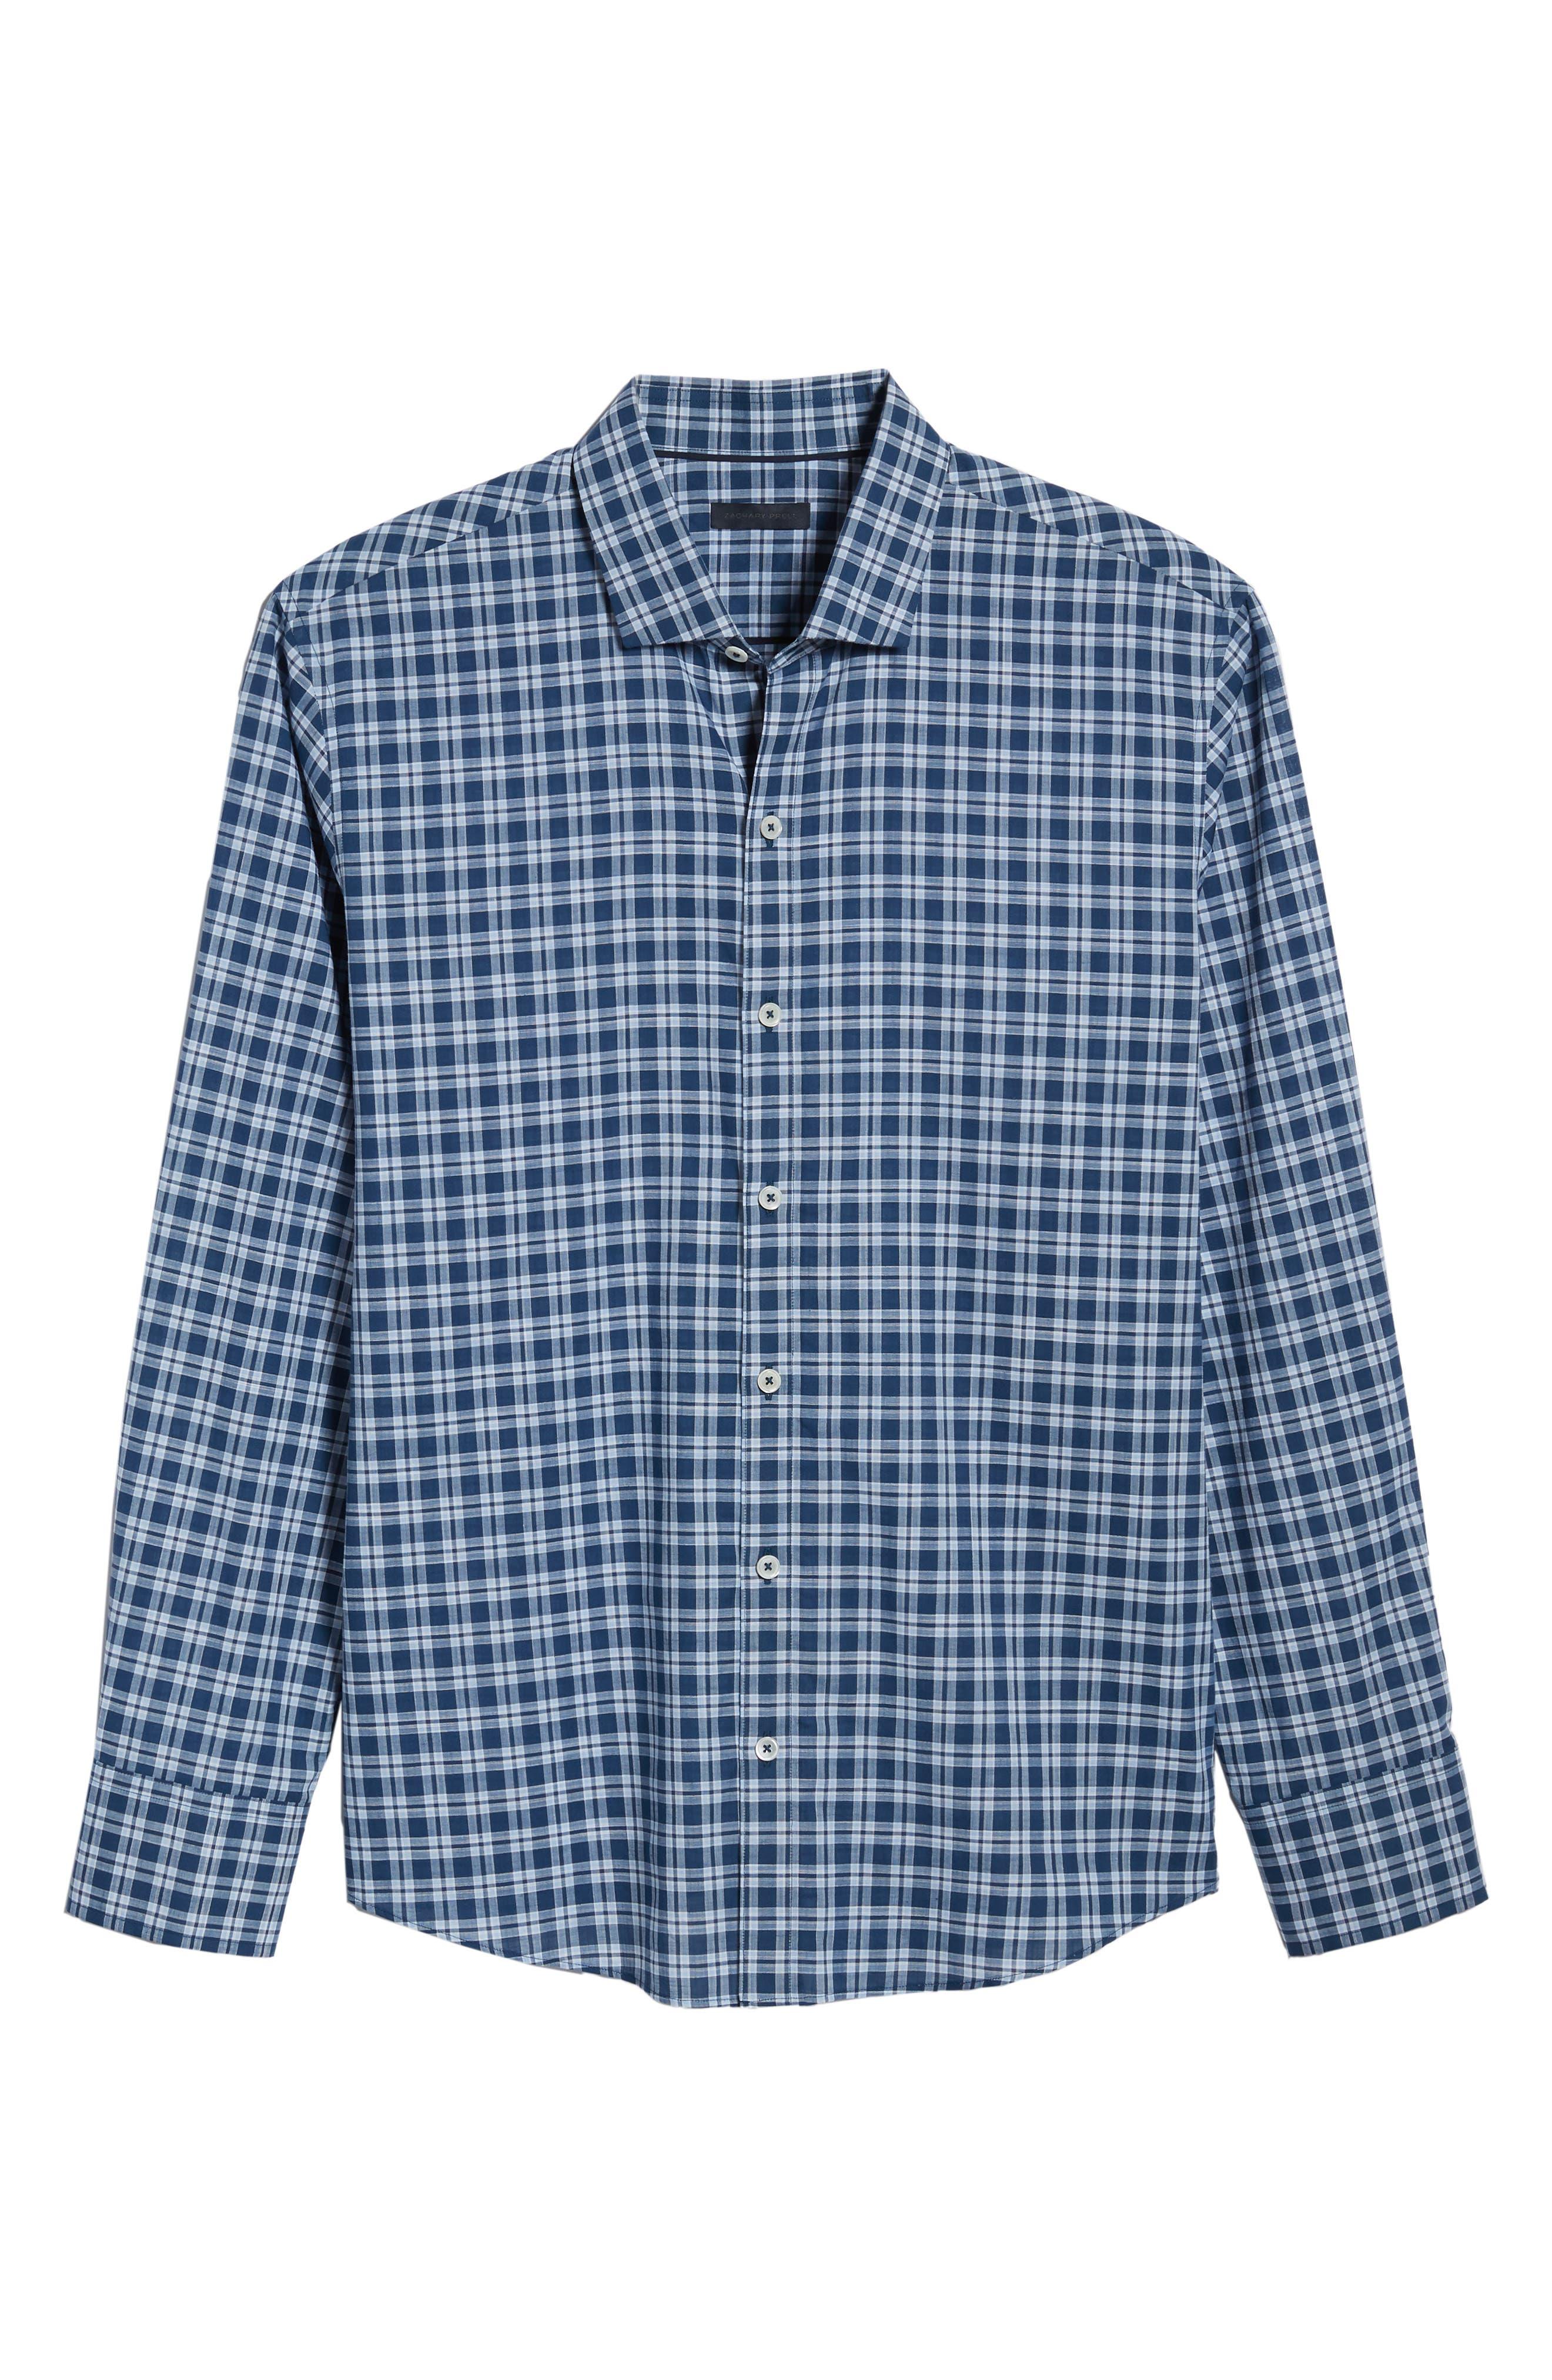 Speer Regular Fit Sport Shirt,                             Alternate thumbnail 6, color,                             Indigo